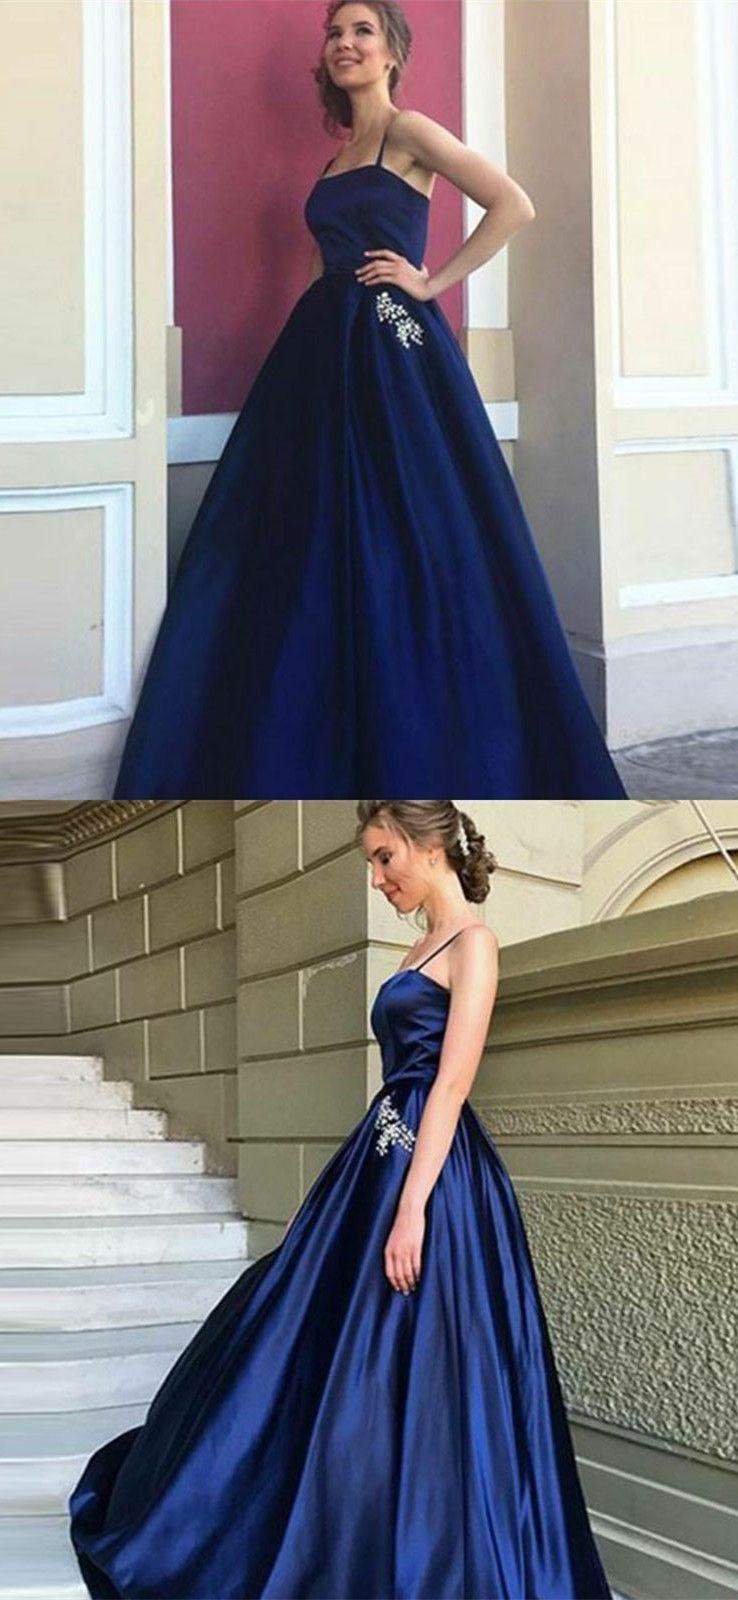 Aline spaghetti straps blue satin prom dress with pockets beading